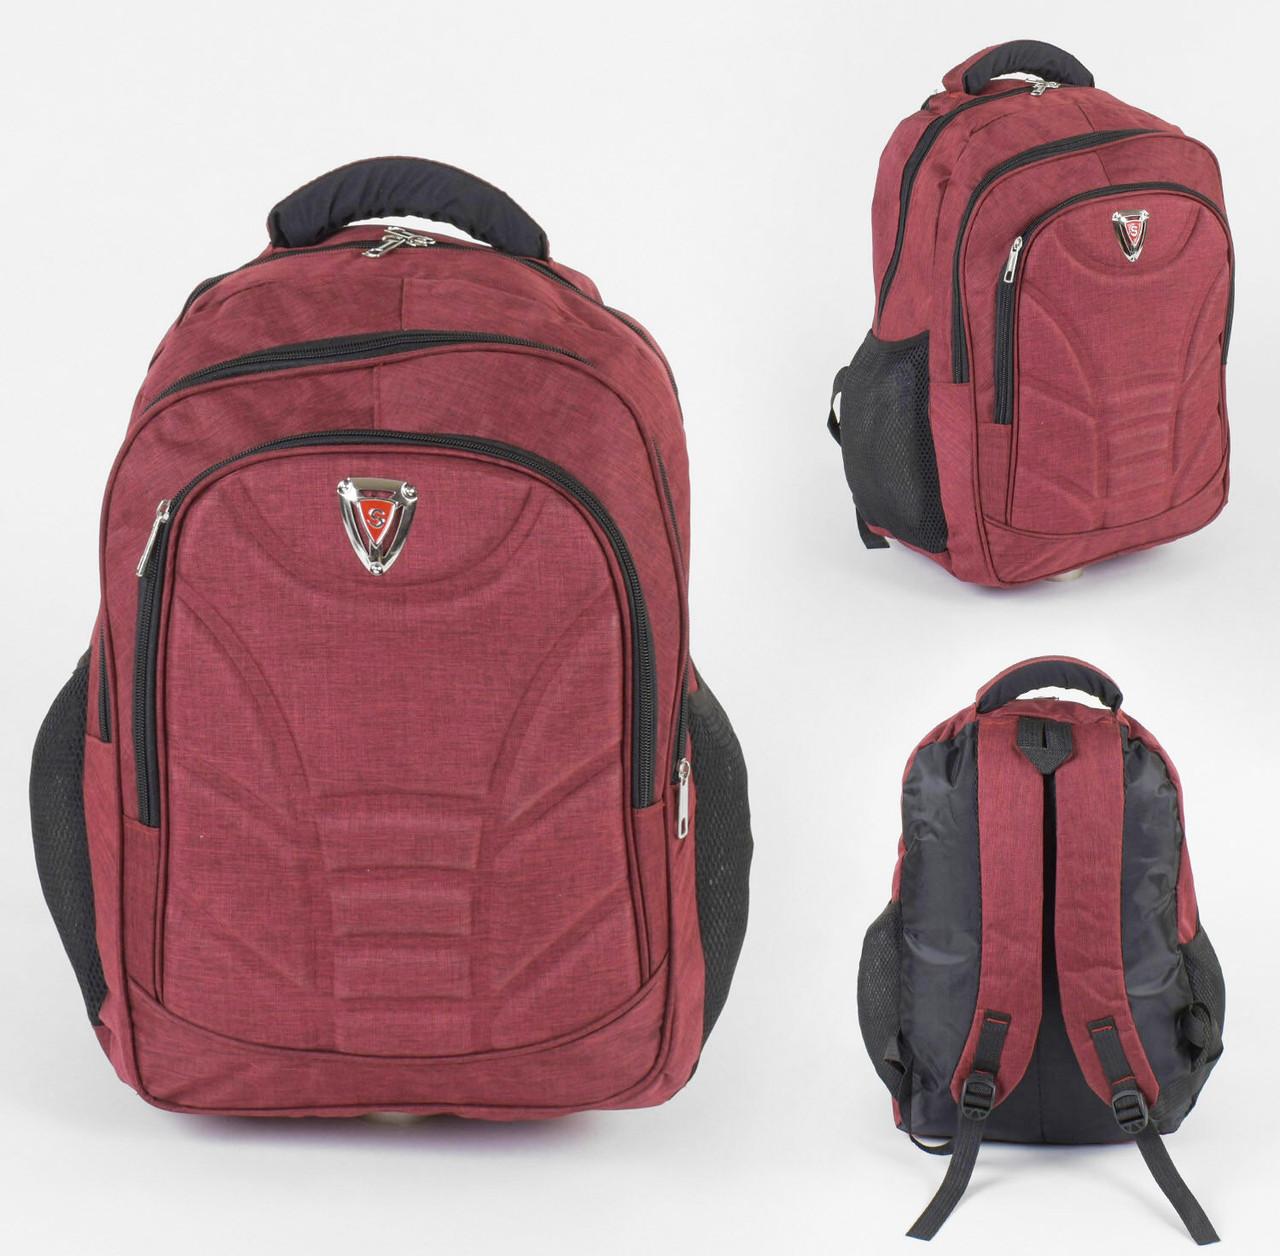 + Подарок Рюкзак 2 цвета, 1 отделение, 2 кармана, мягкая спинка, в пакете